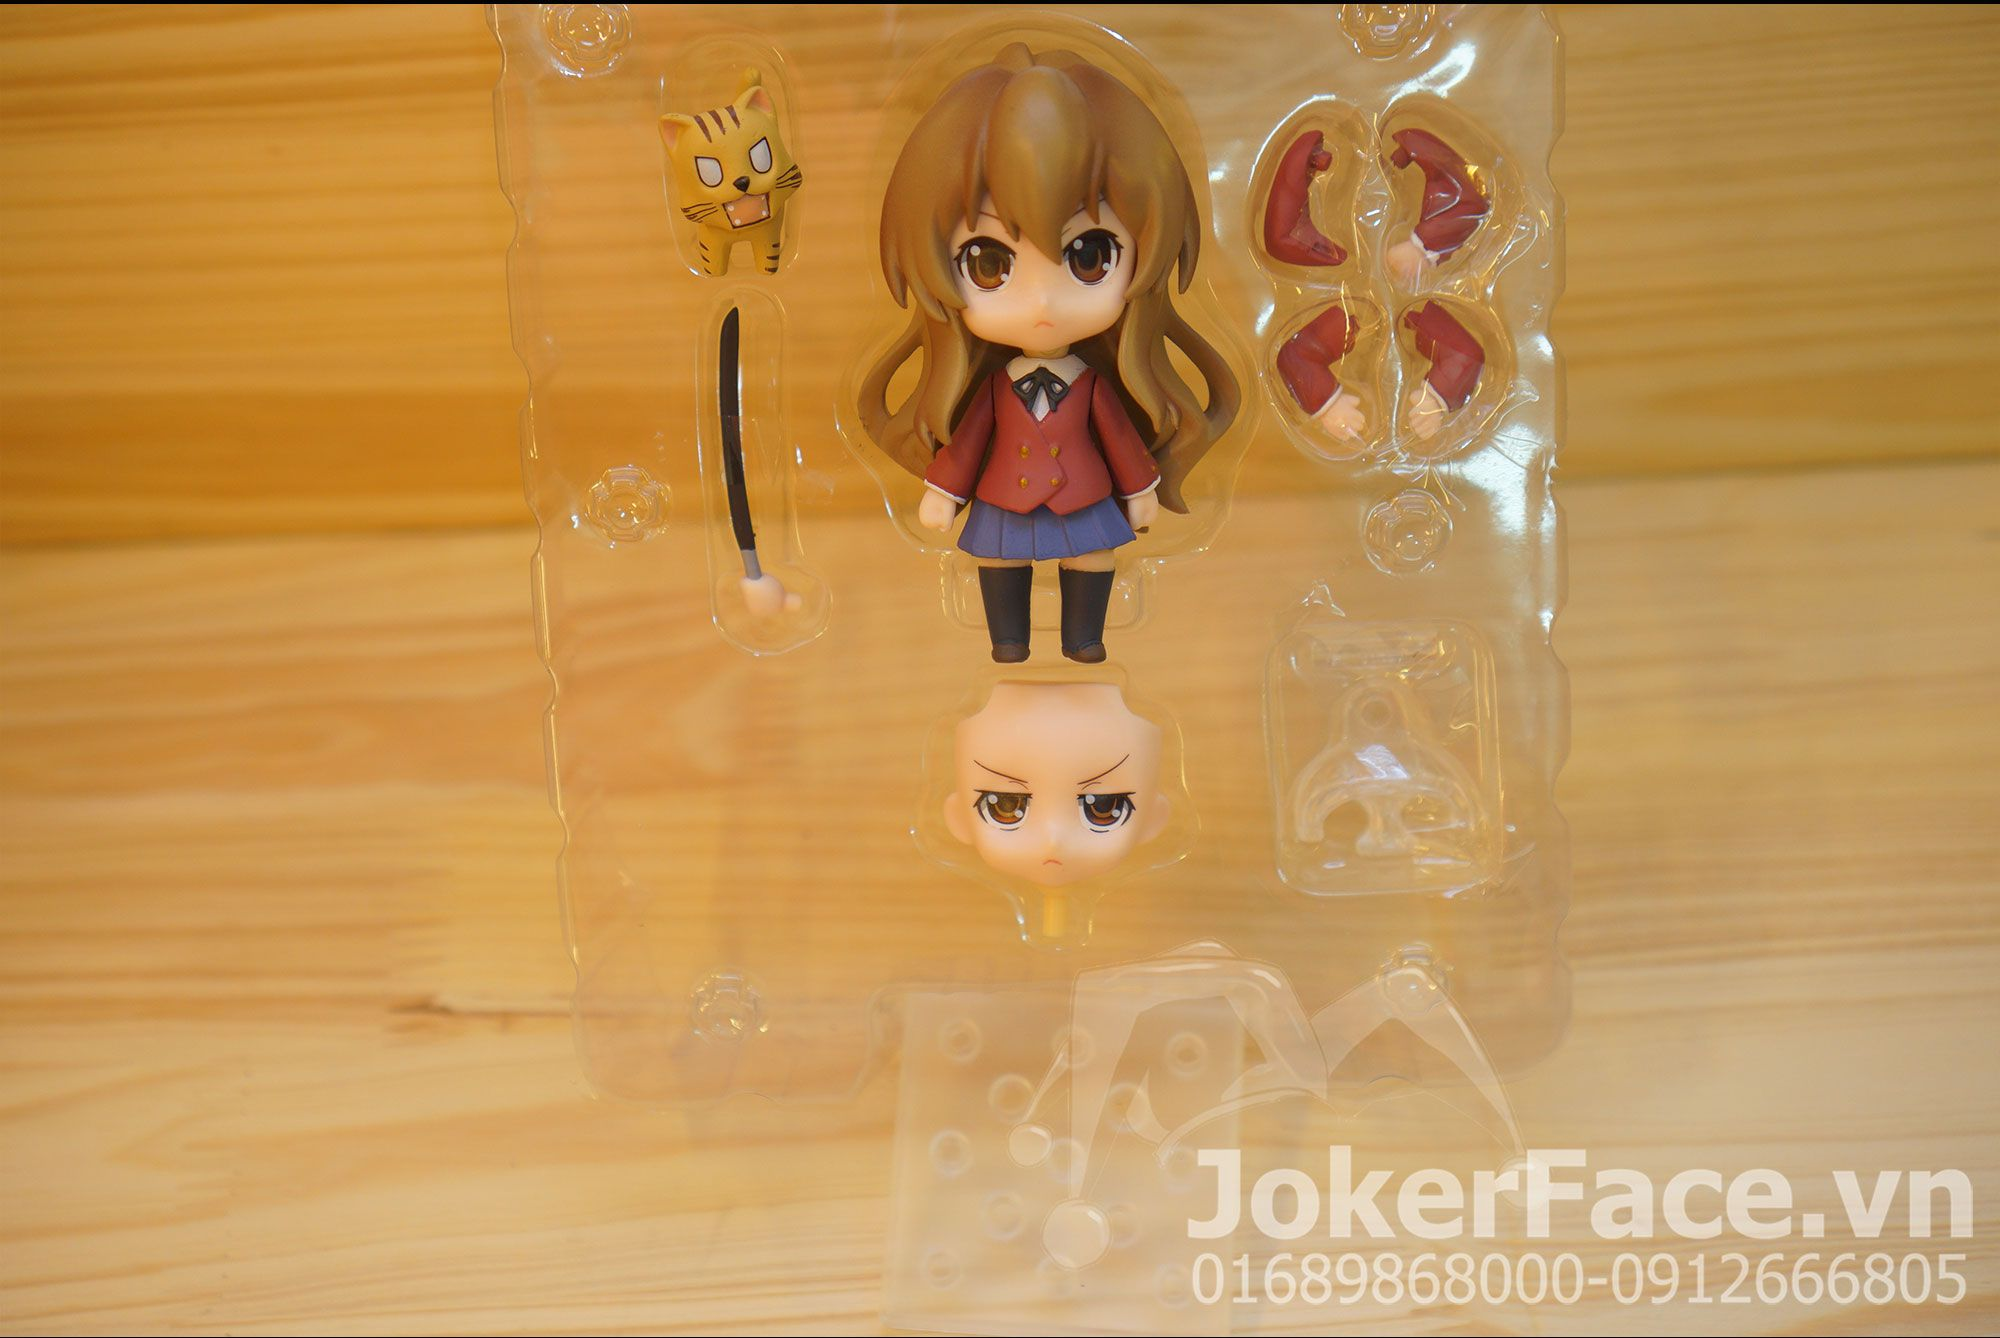 Nendoroid Aisaka Taiga Toradora. Joker Face Shop Shop